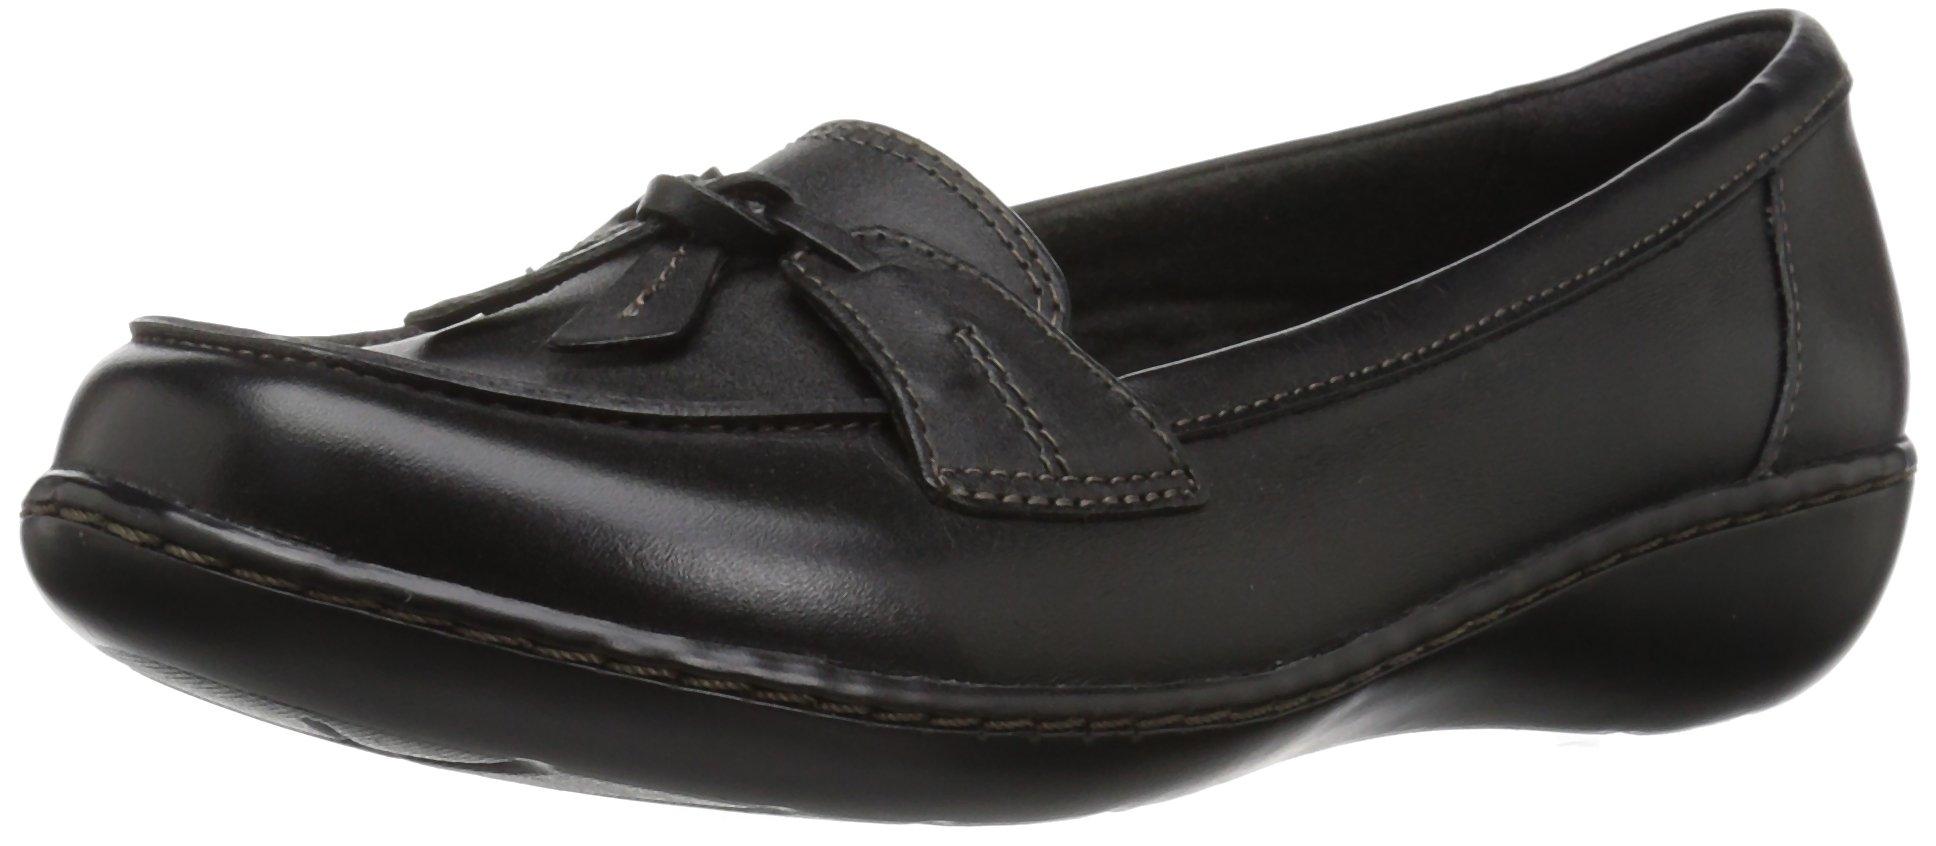 CLARKS Women's Ashland Bubble Slip-on Loafer, Black Leather, 9 W US